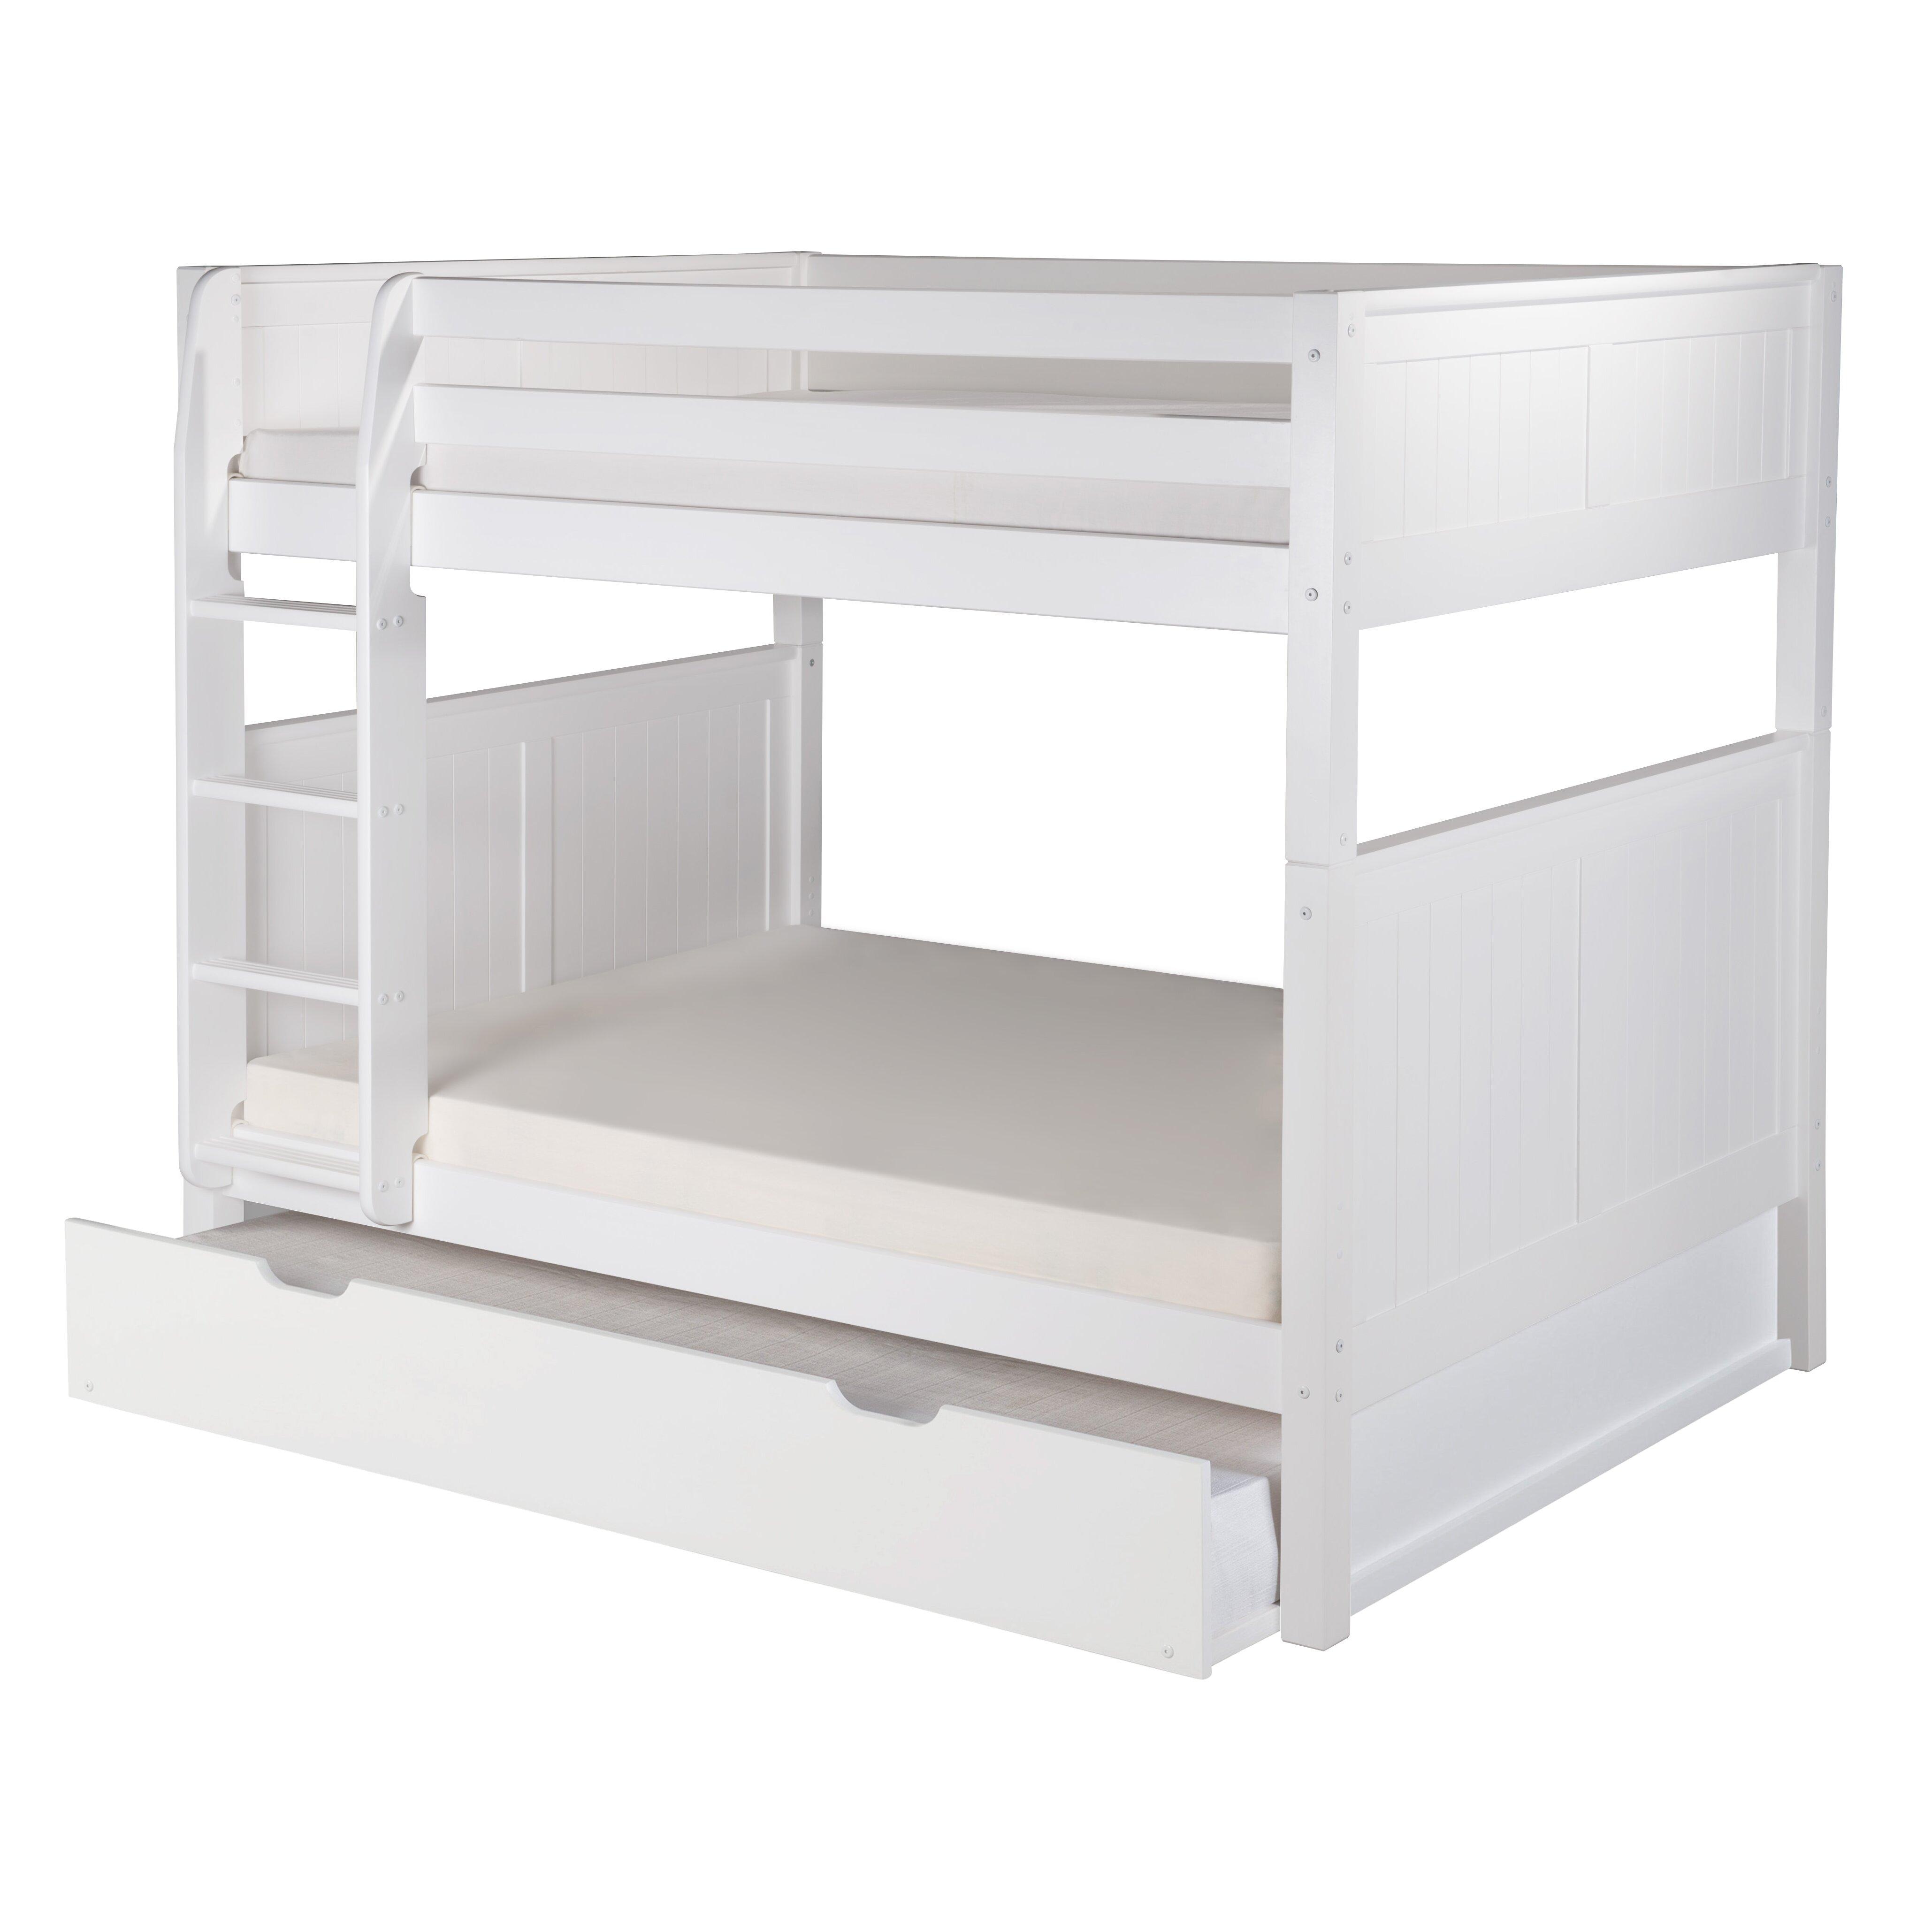 Camaflexi Traditional Camaflexi Full Over Full Bunk Bed